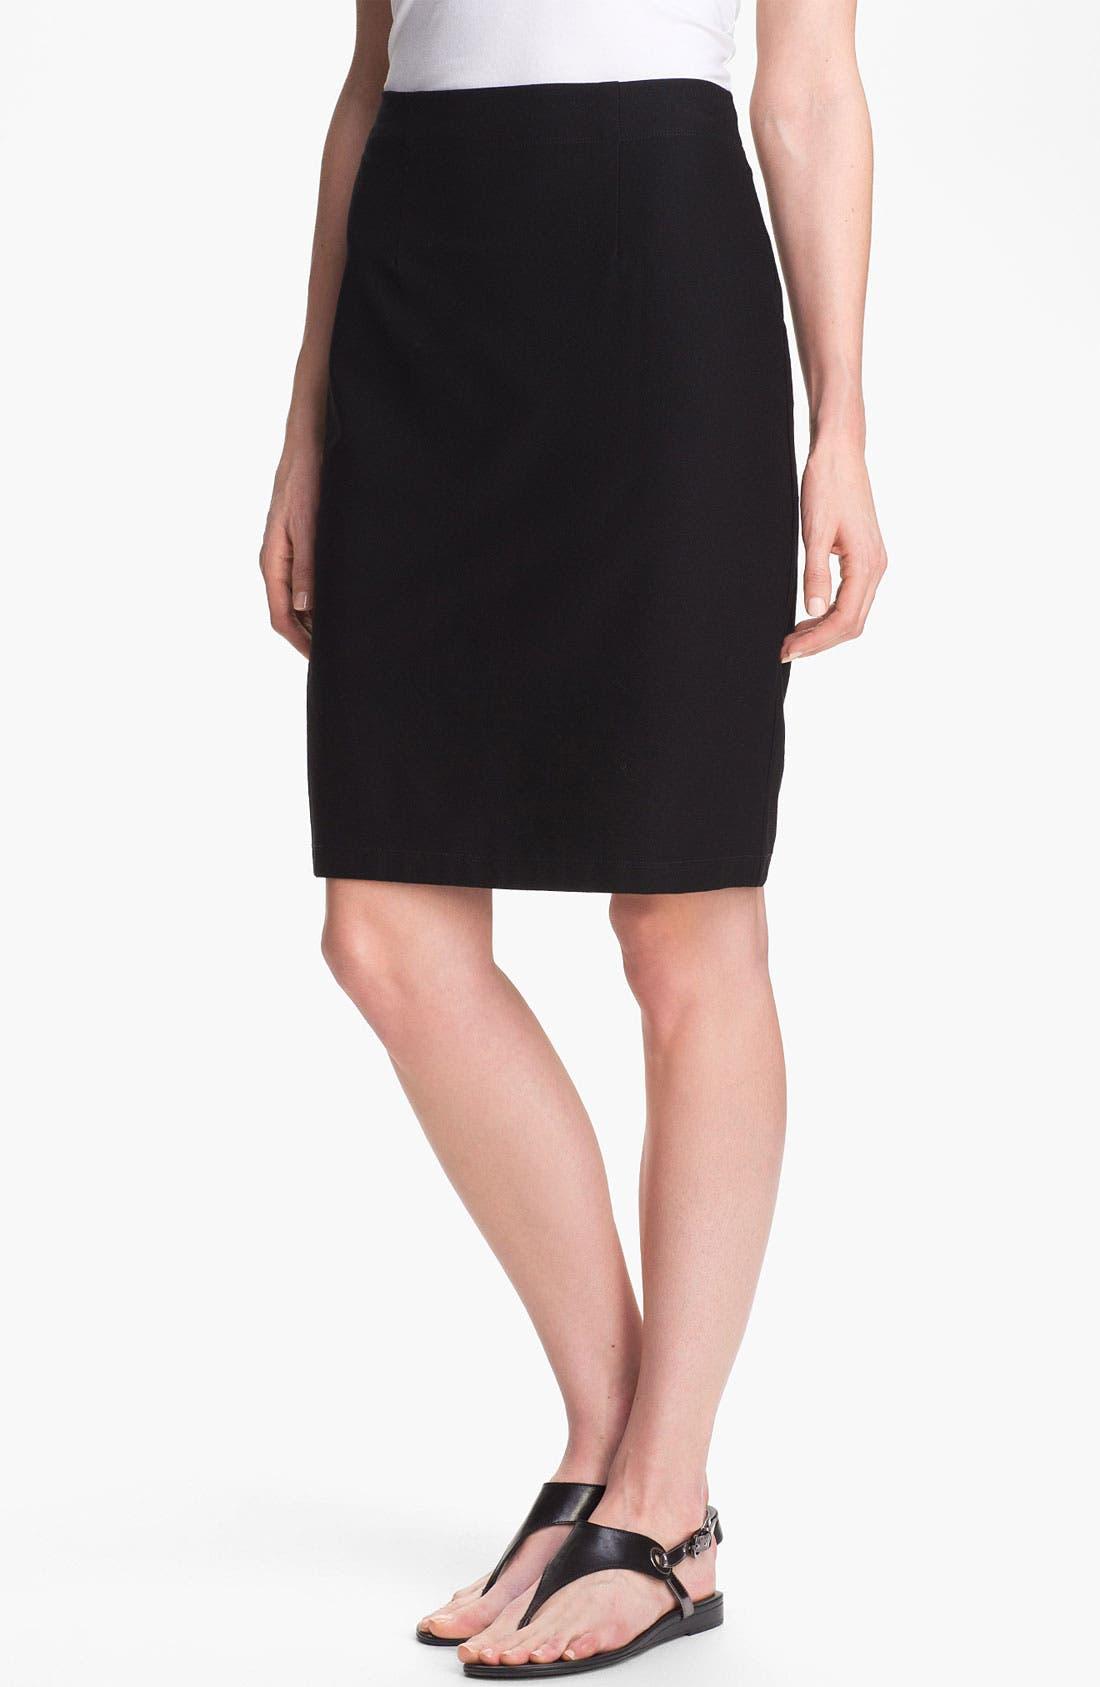 Alternate Image 1 Selected - Eileen Fisher Knit Pencil Skirt (Regular & Petite)